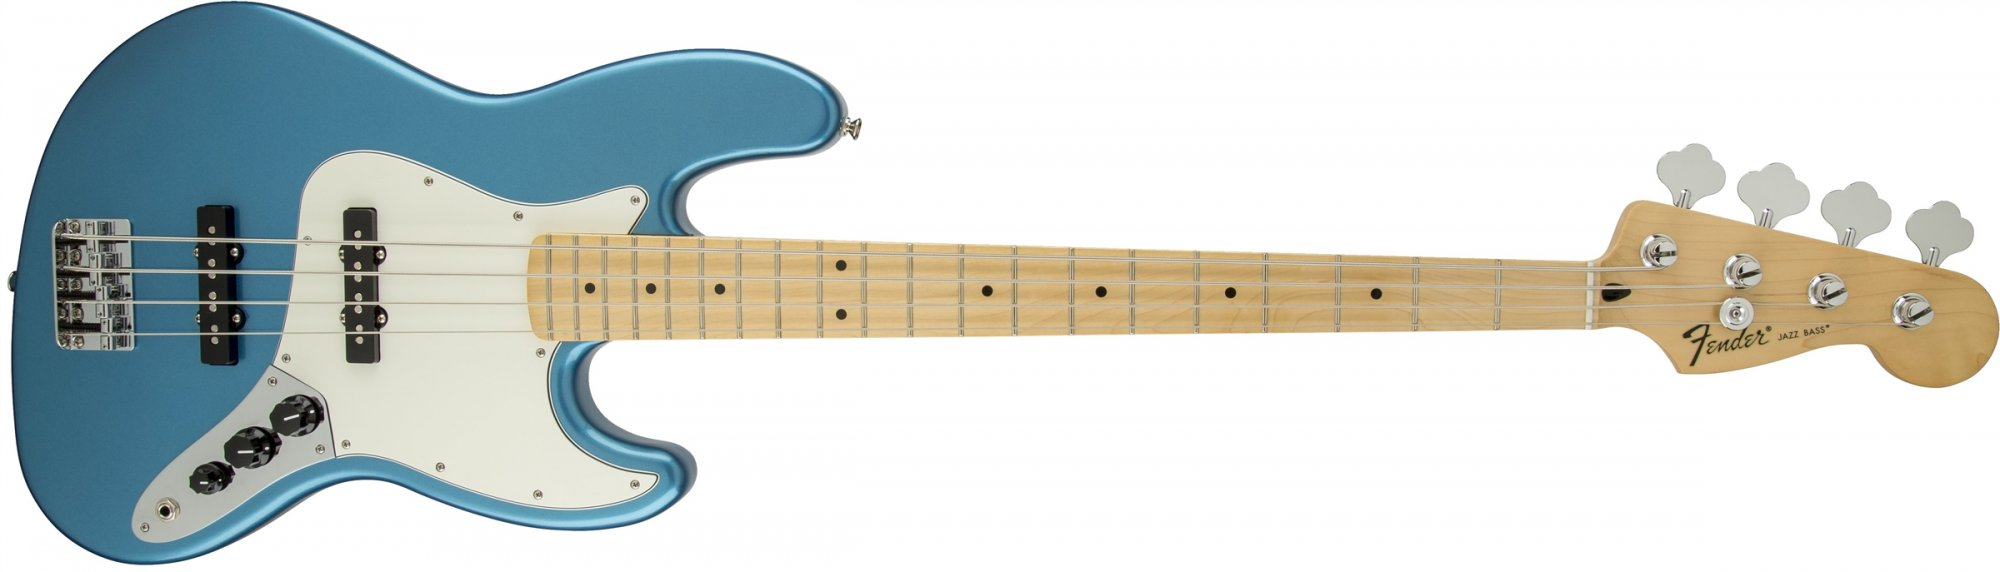 Fender Standard Jazz Bass Guitar Maple Fretboard - Lake Placid Blue